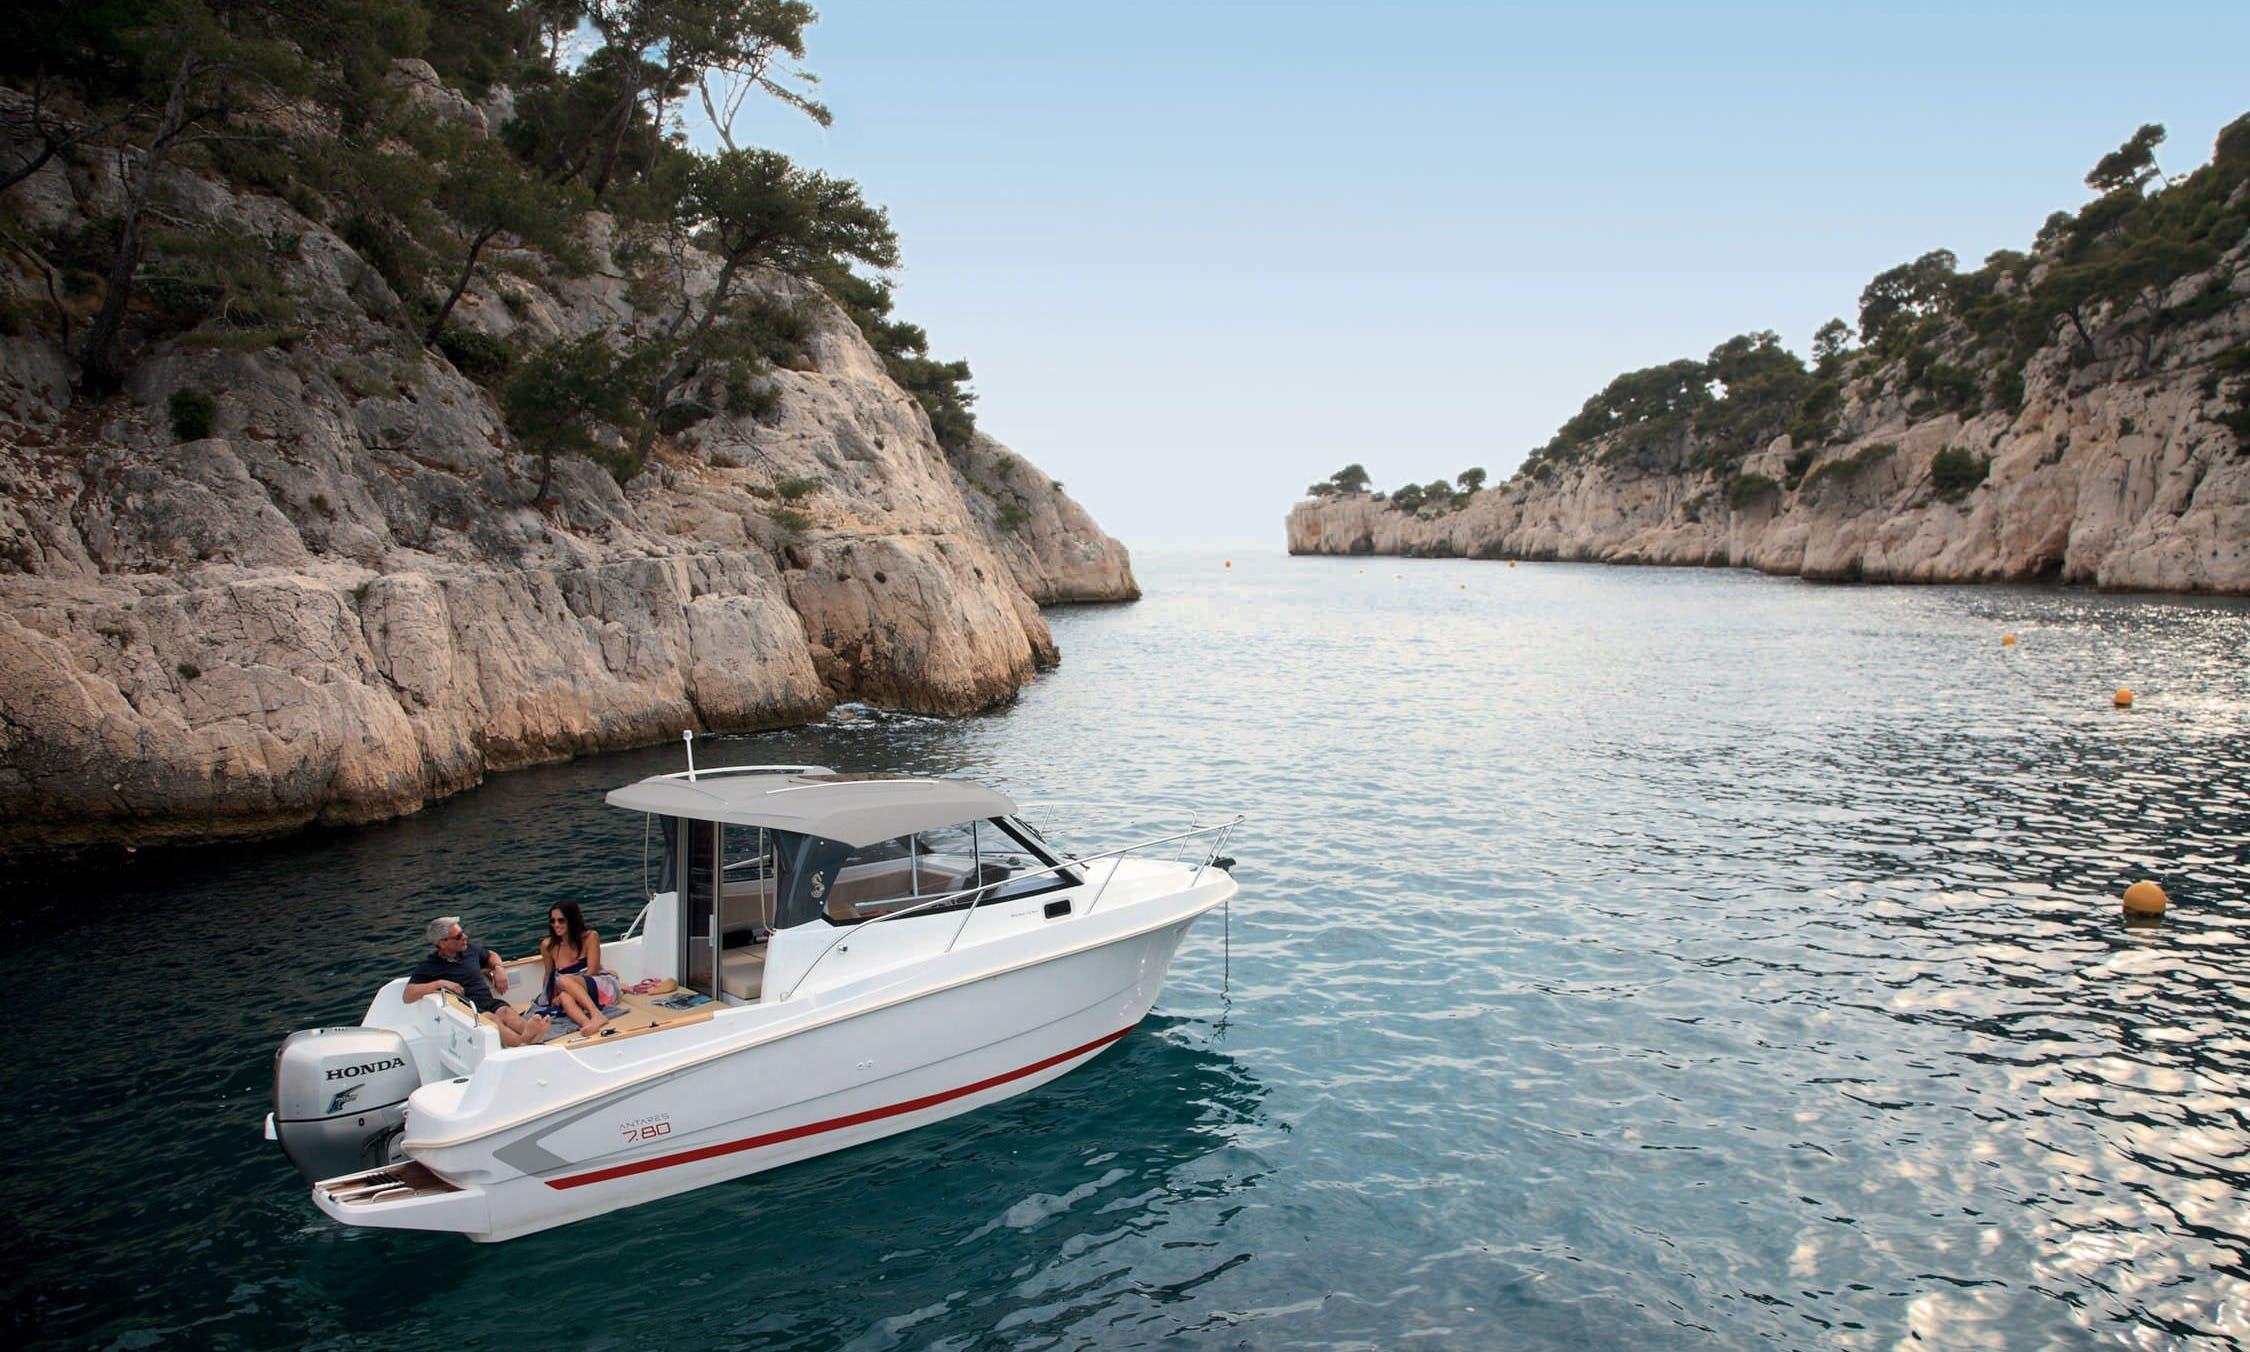 Beneteau Antares 7.80 - Motor Yacht Rental in Split